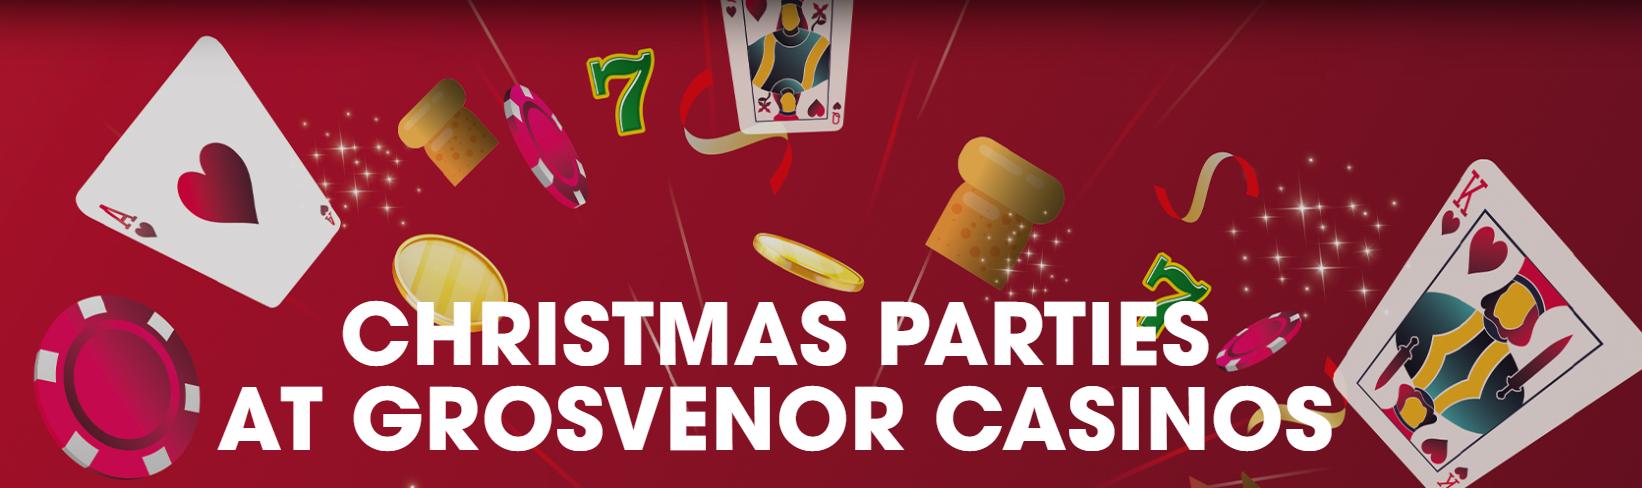 Grosvenor Casino Christmas Party.